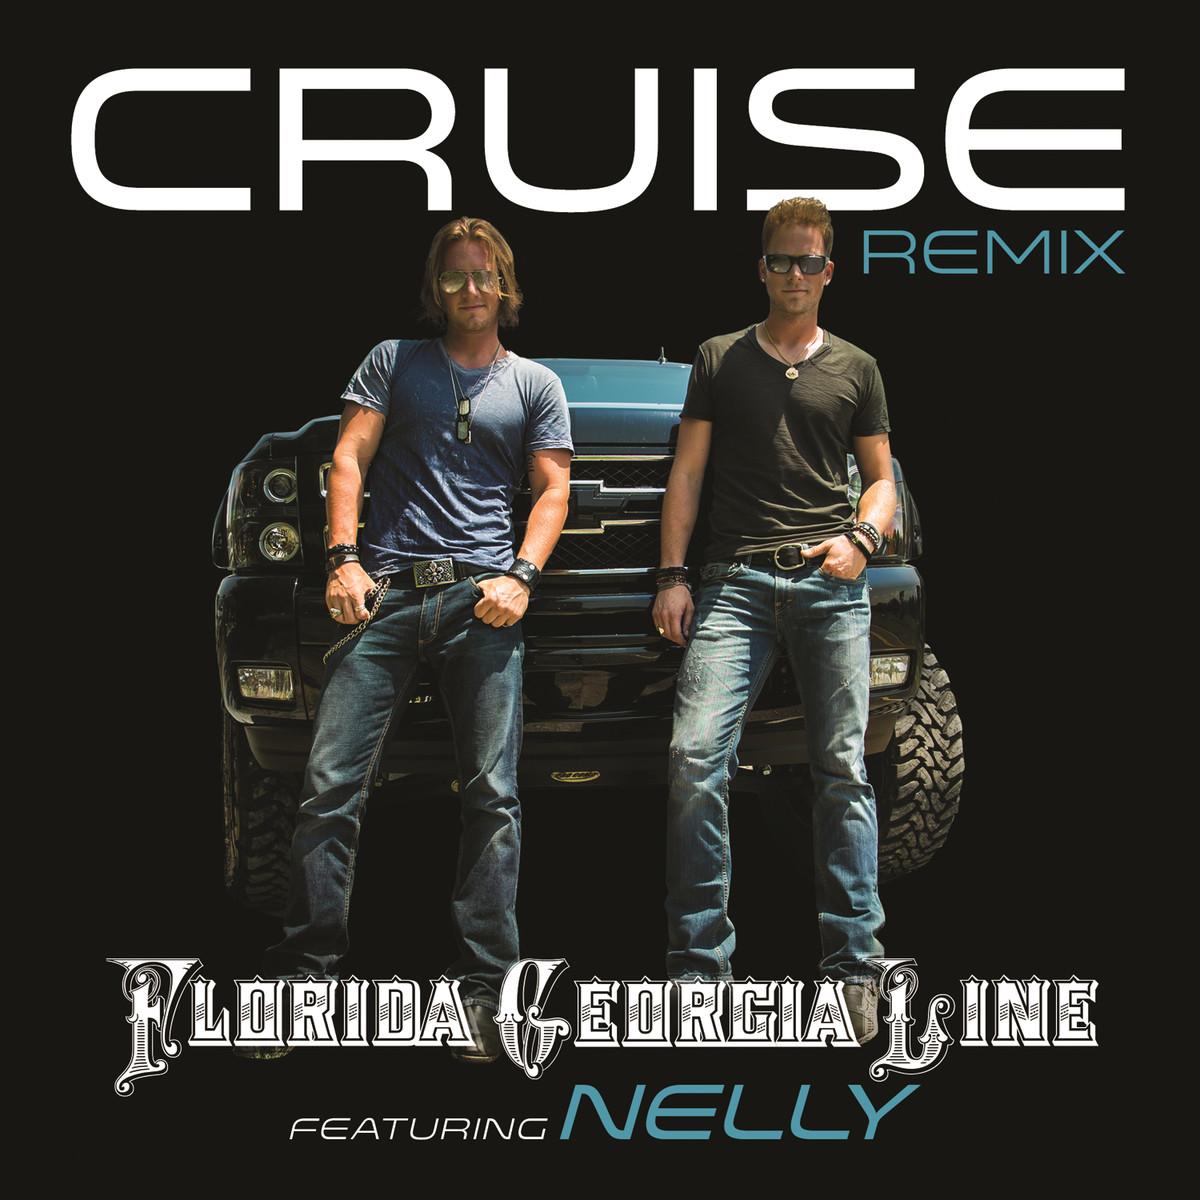 Florida Georgia Line Cruise Remix 2013 Saving Country Music